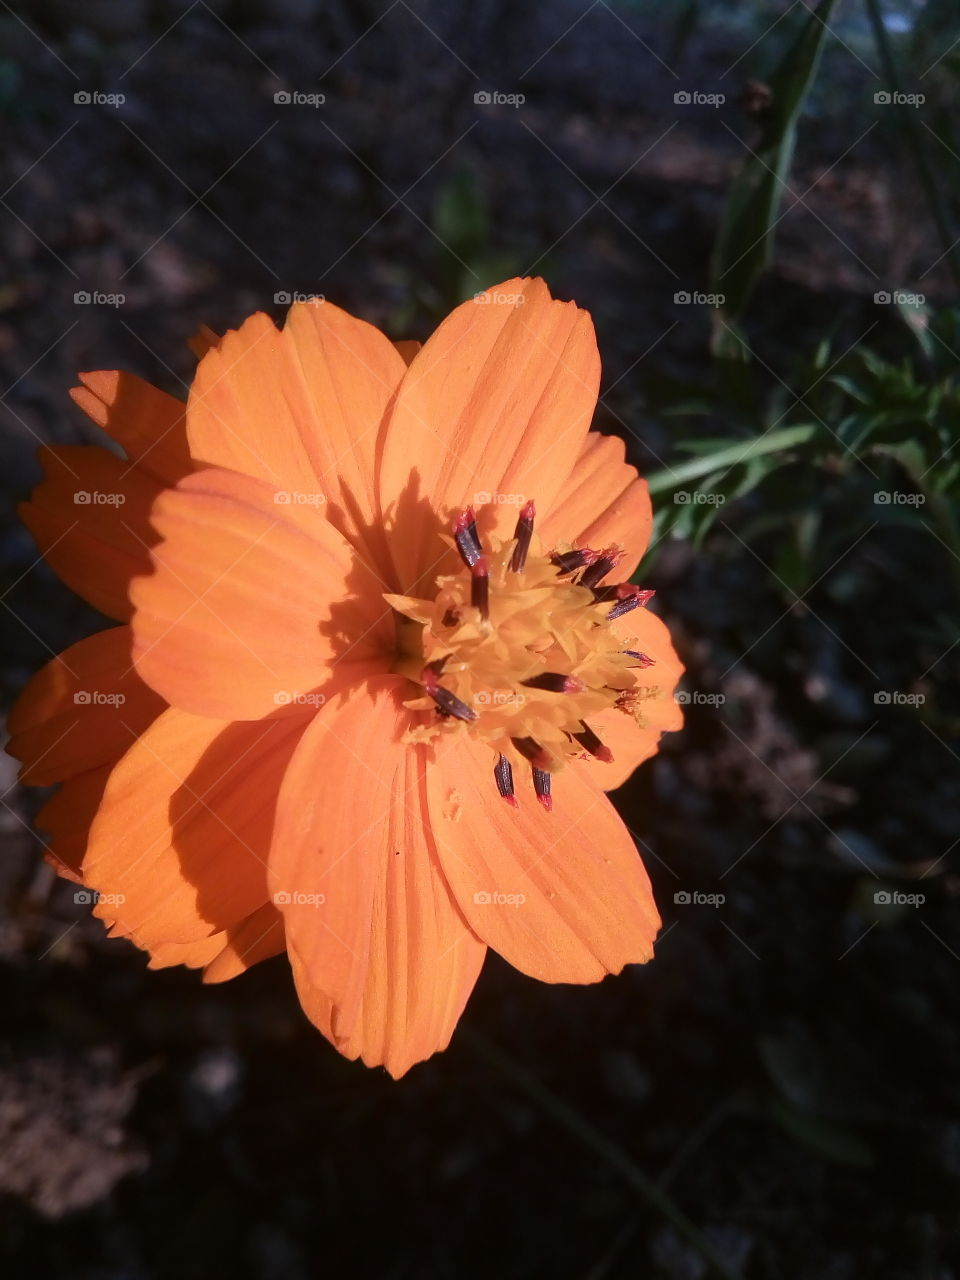 flower 2018-01-17 016  #আমার_চোখে #আমার_গ্রাম #nature #flower  #eukaryota #plantae #angiosperms #eudicots